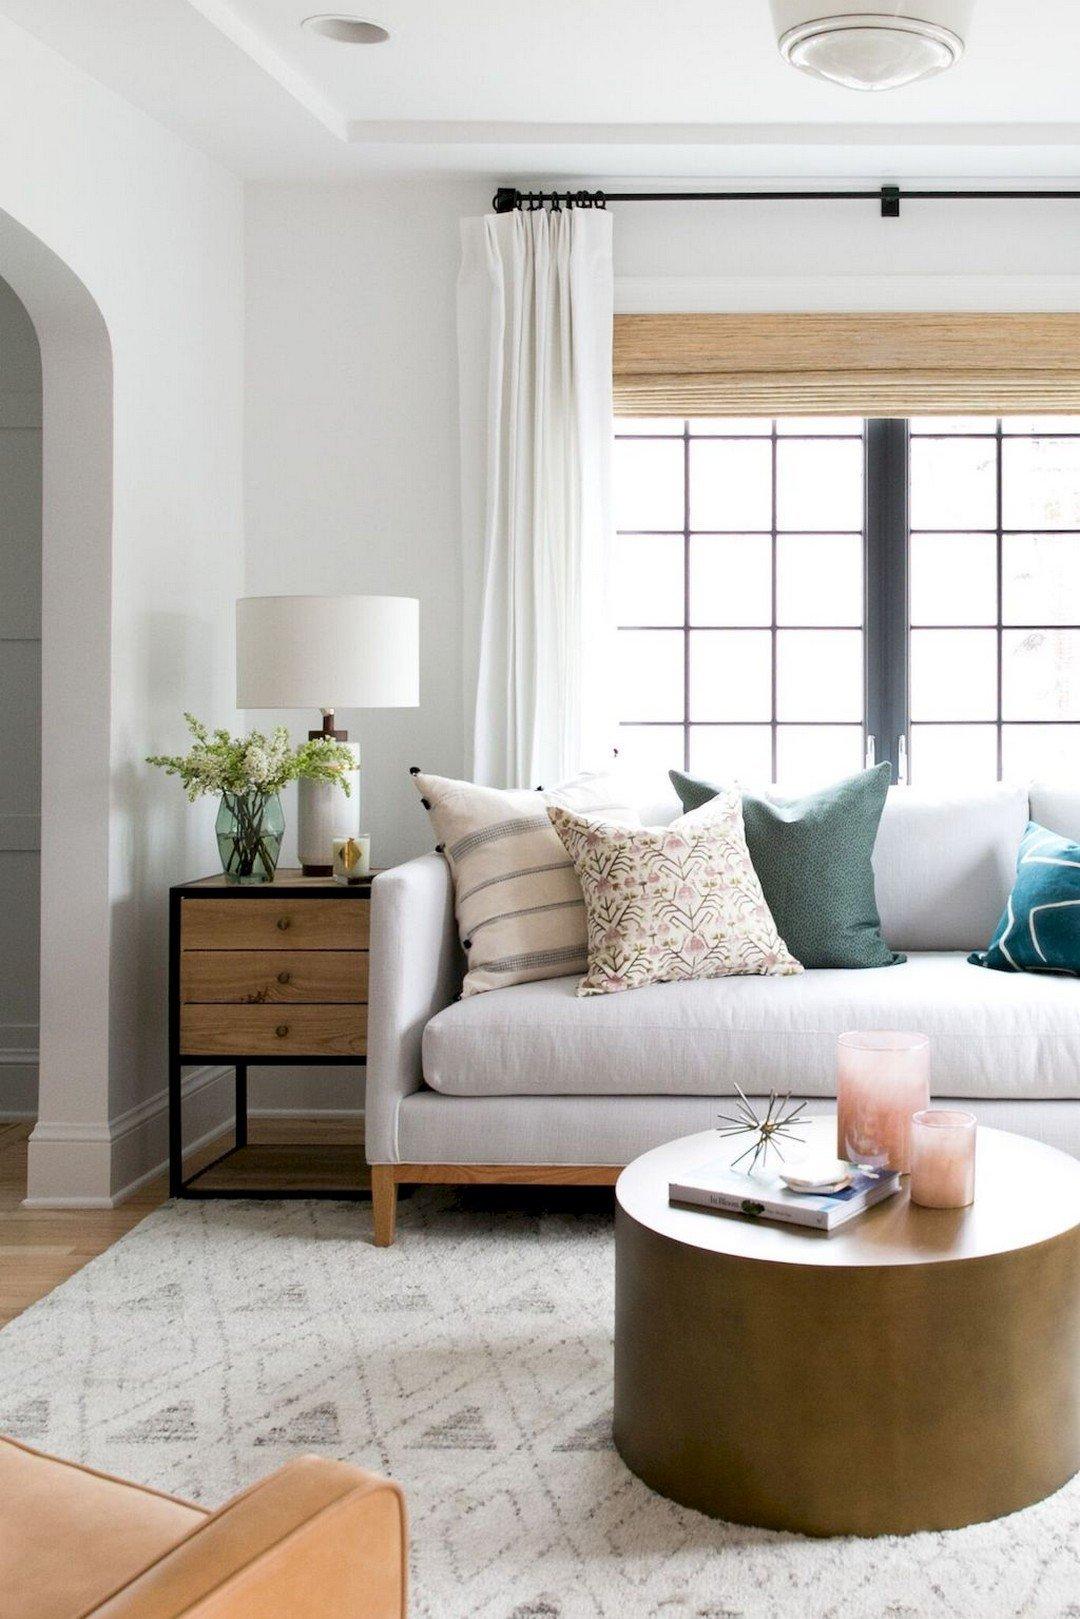 Cozy Small Living Room Ideas Elegant Perfect and Cozy Small Living Room Design 1 De Agz